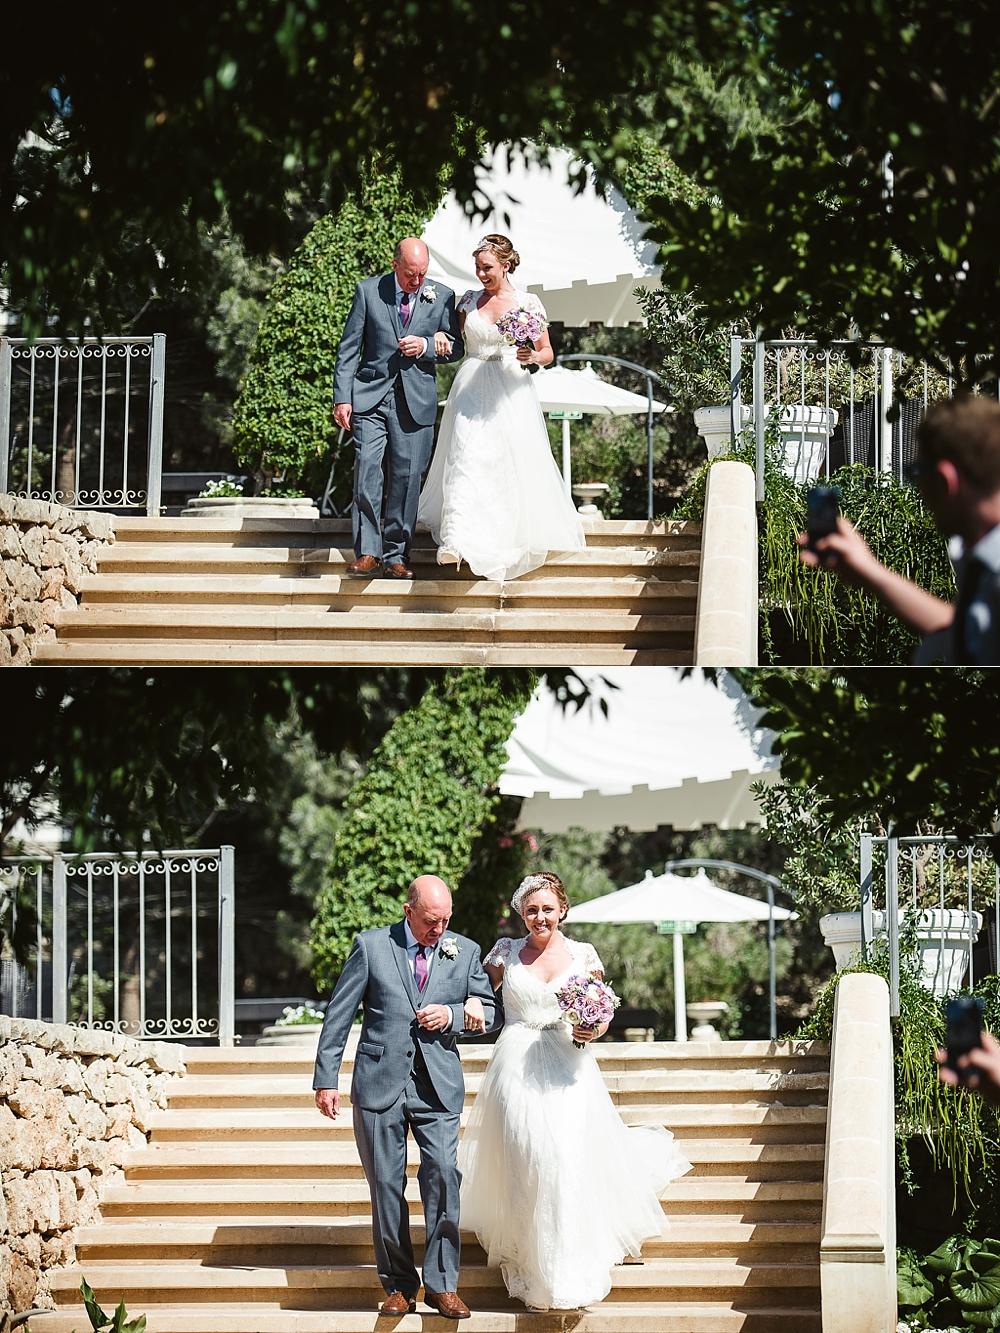 Villa Arrigo Wedding - Wedding Photography Malta - Shane P. Watts